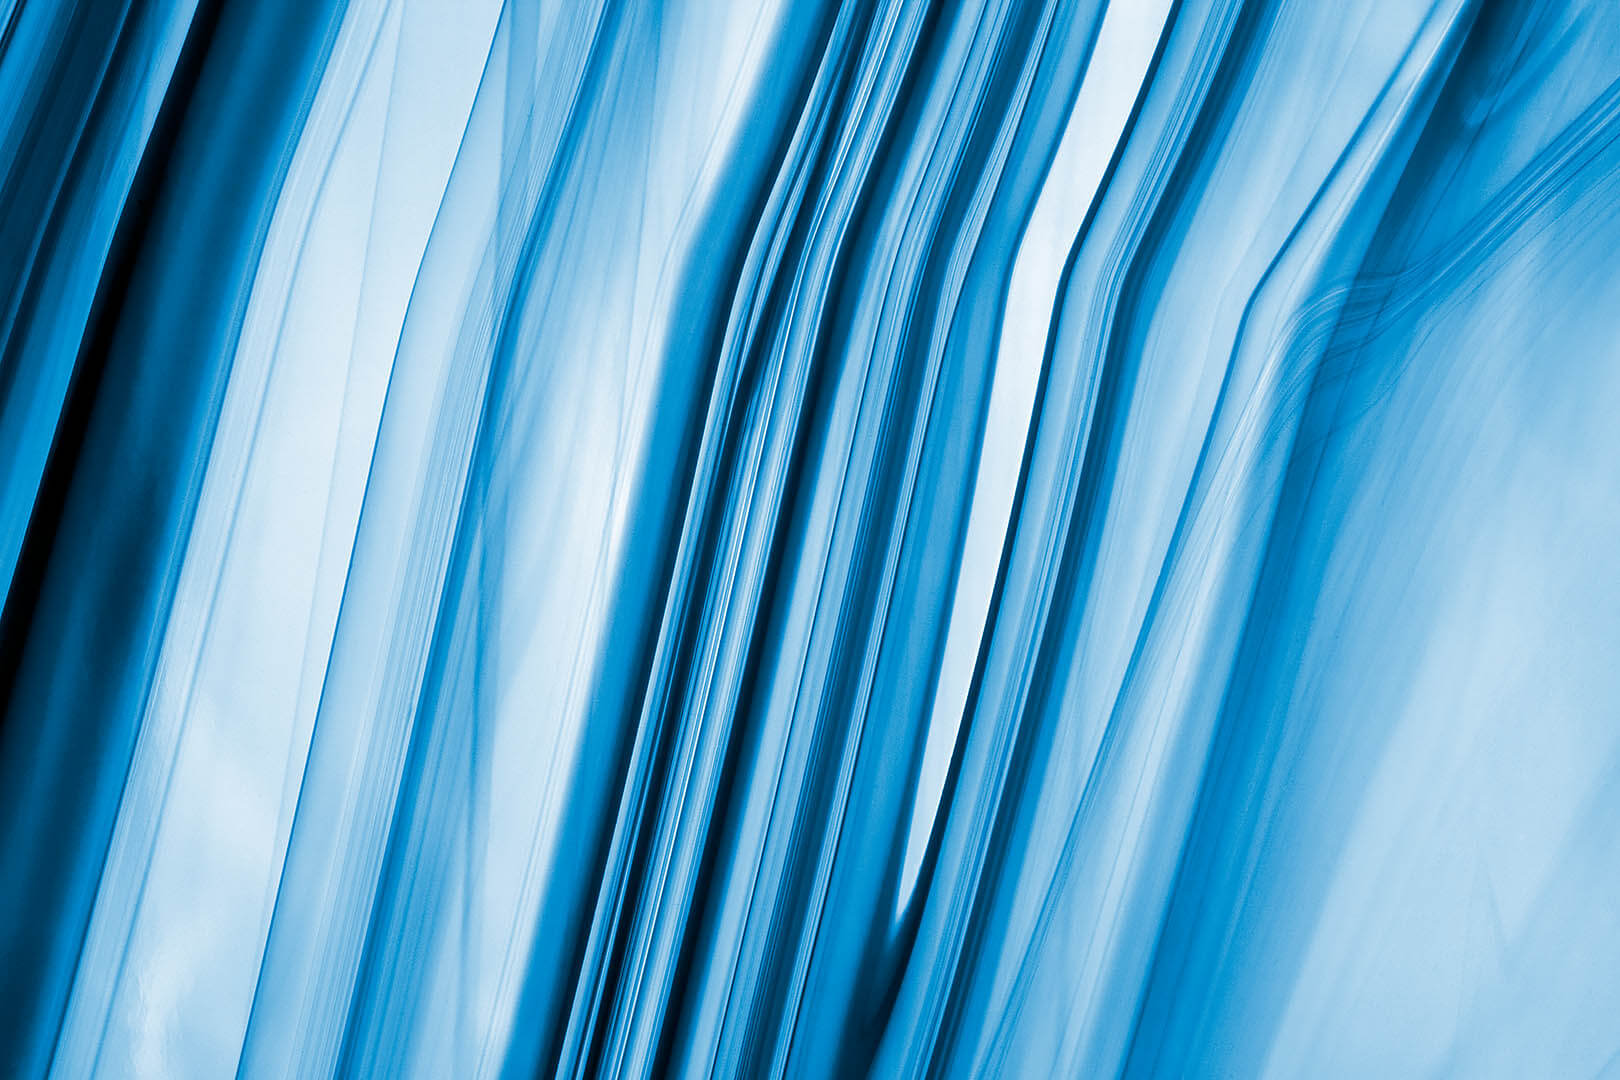 Blue Glass #3